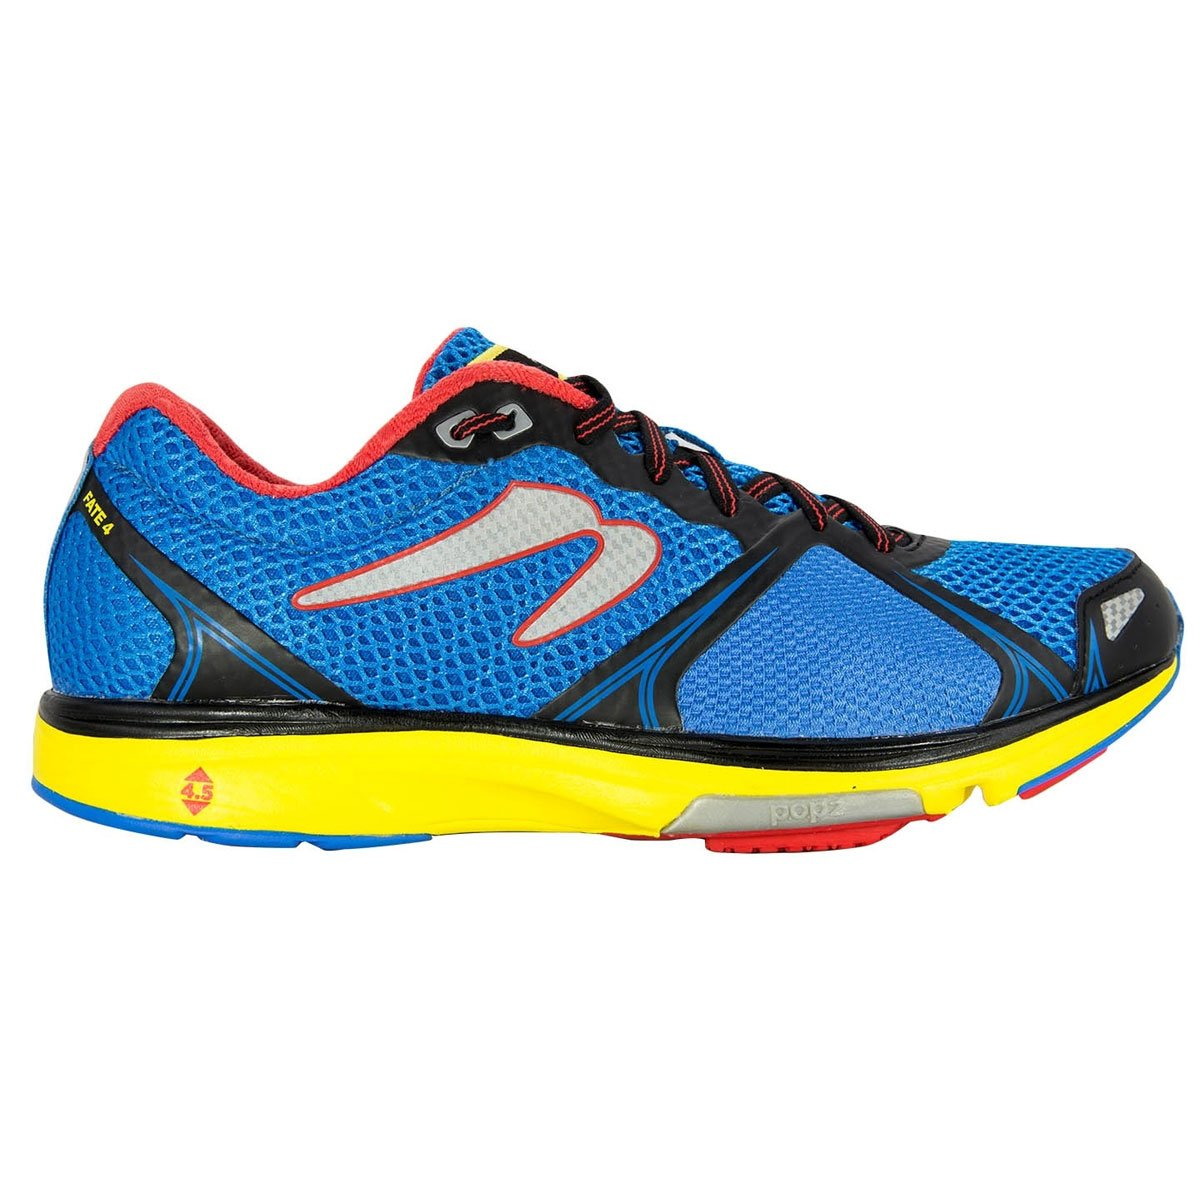 New Balance Women s 530v2 Flex Ride Running Shoe